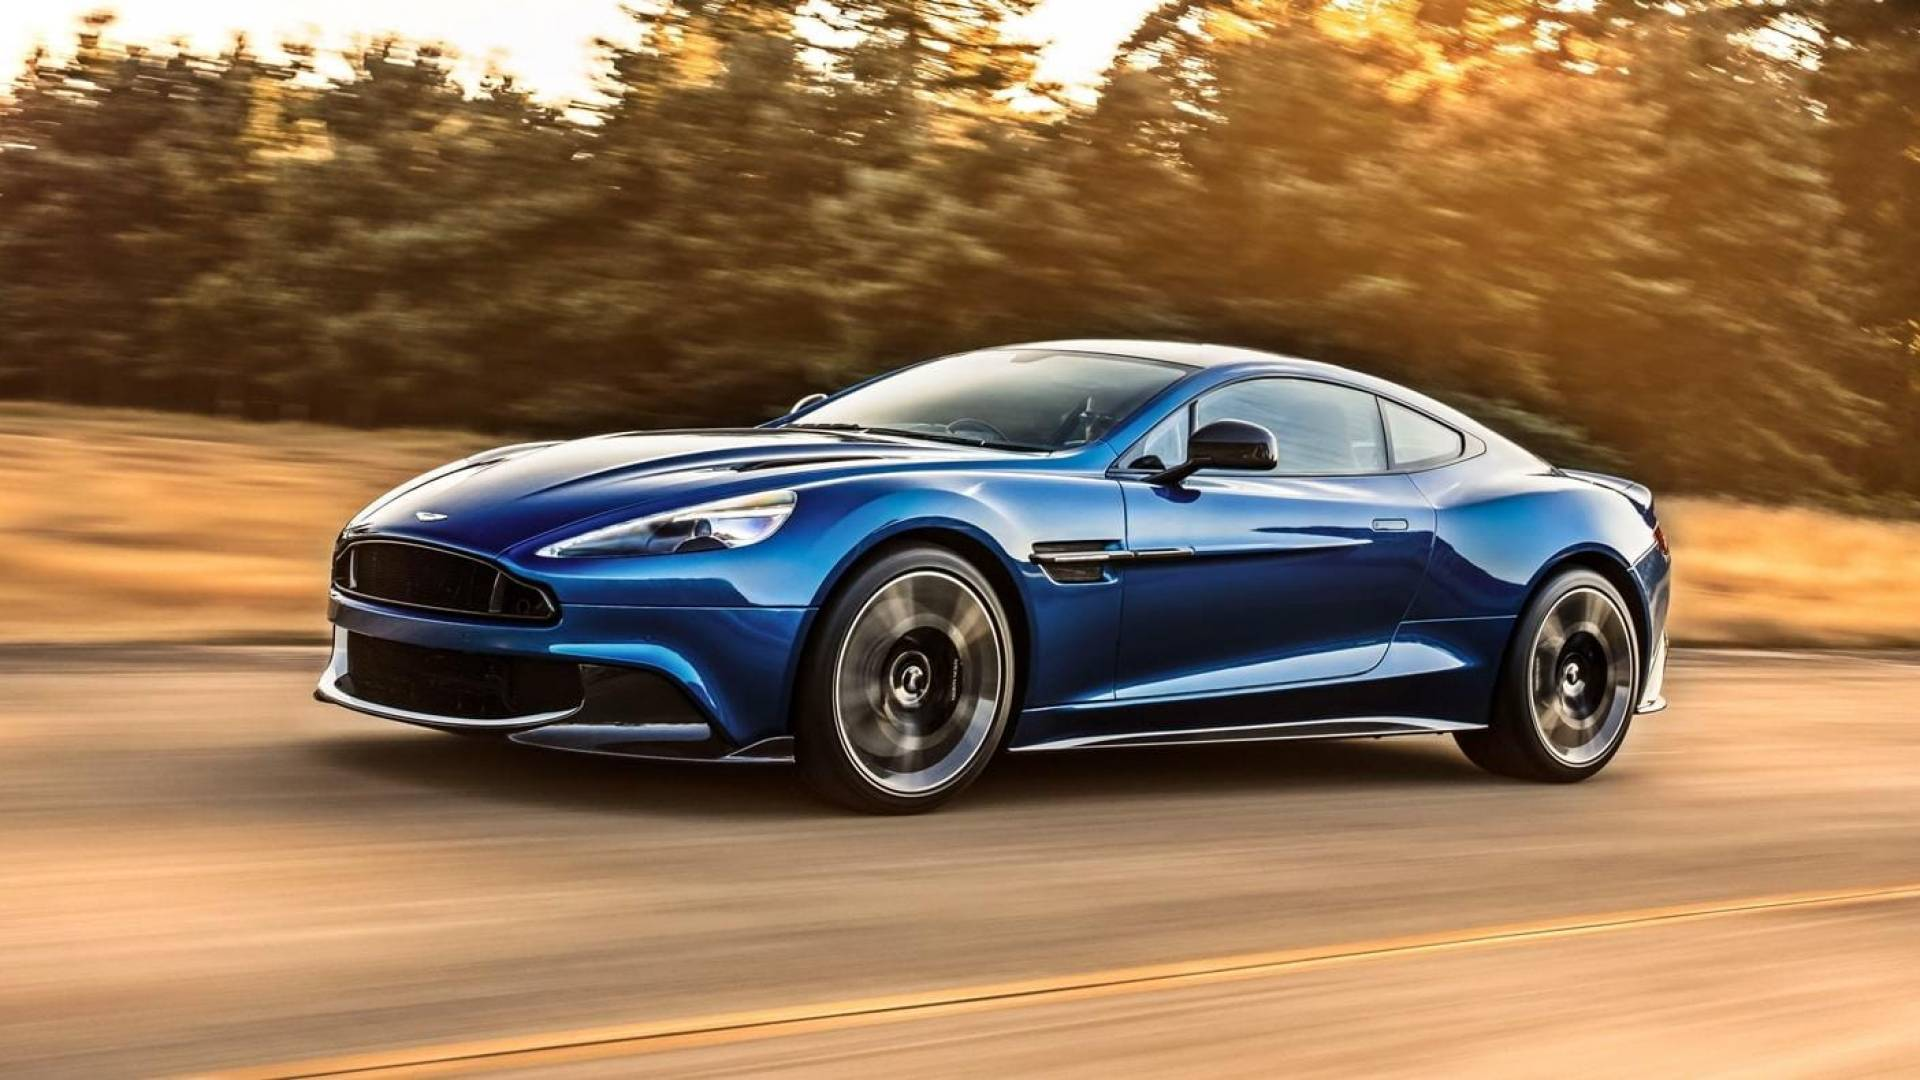 Aston Martin Vanquish S superdepotivo azul en la carretera